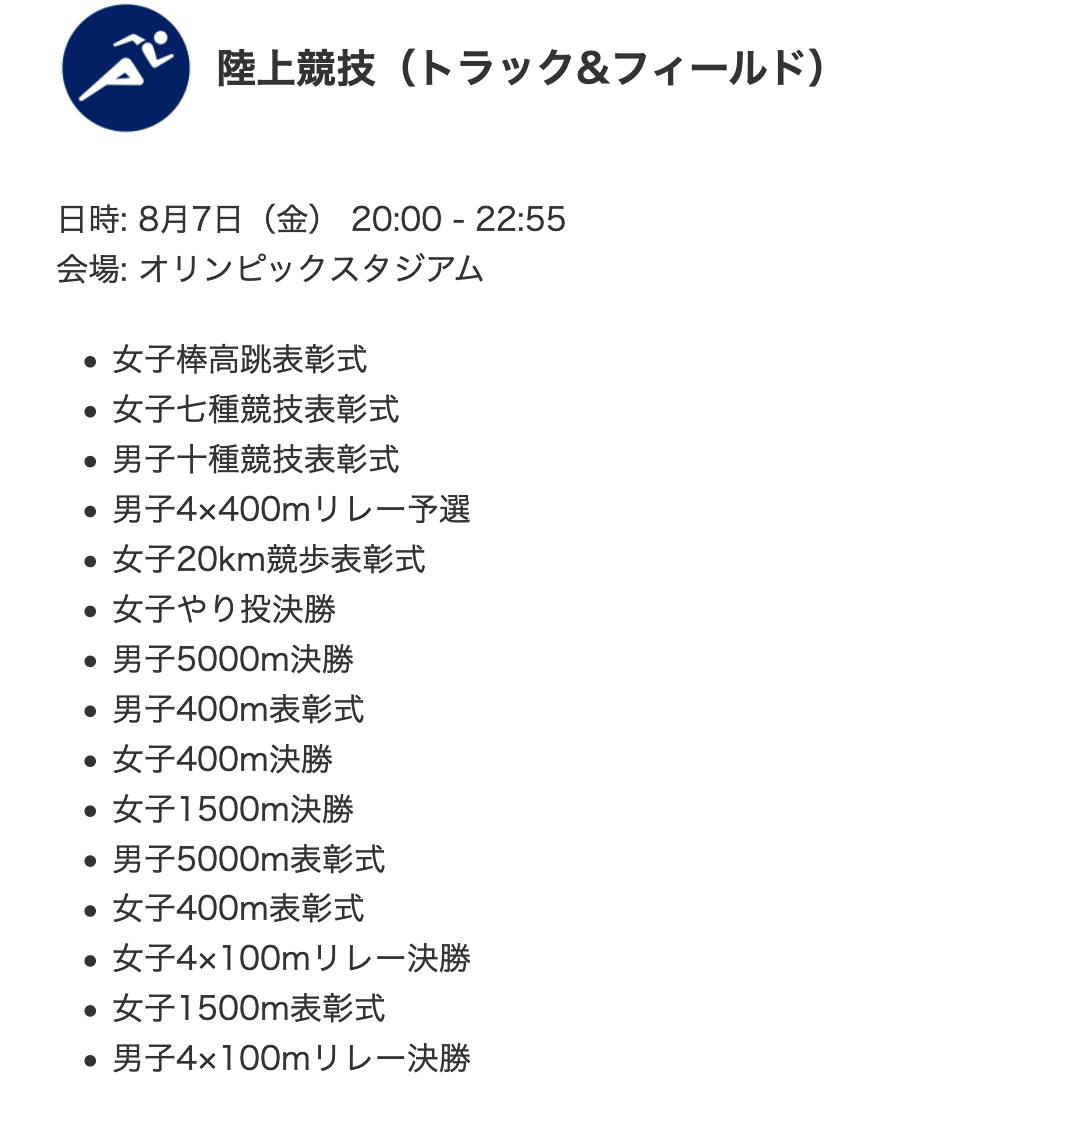 f:id:shihon79:20190620192723p:plain